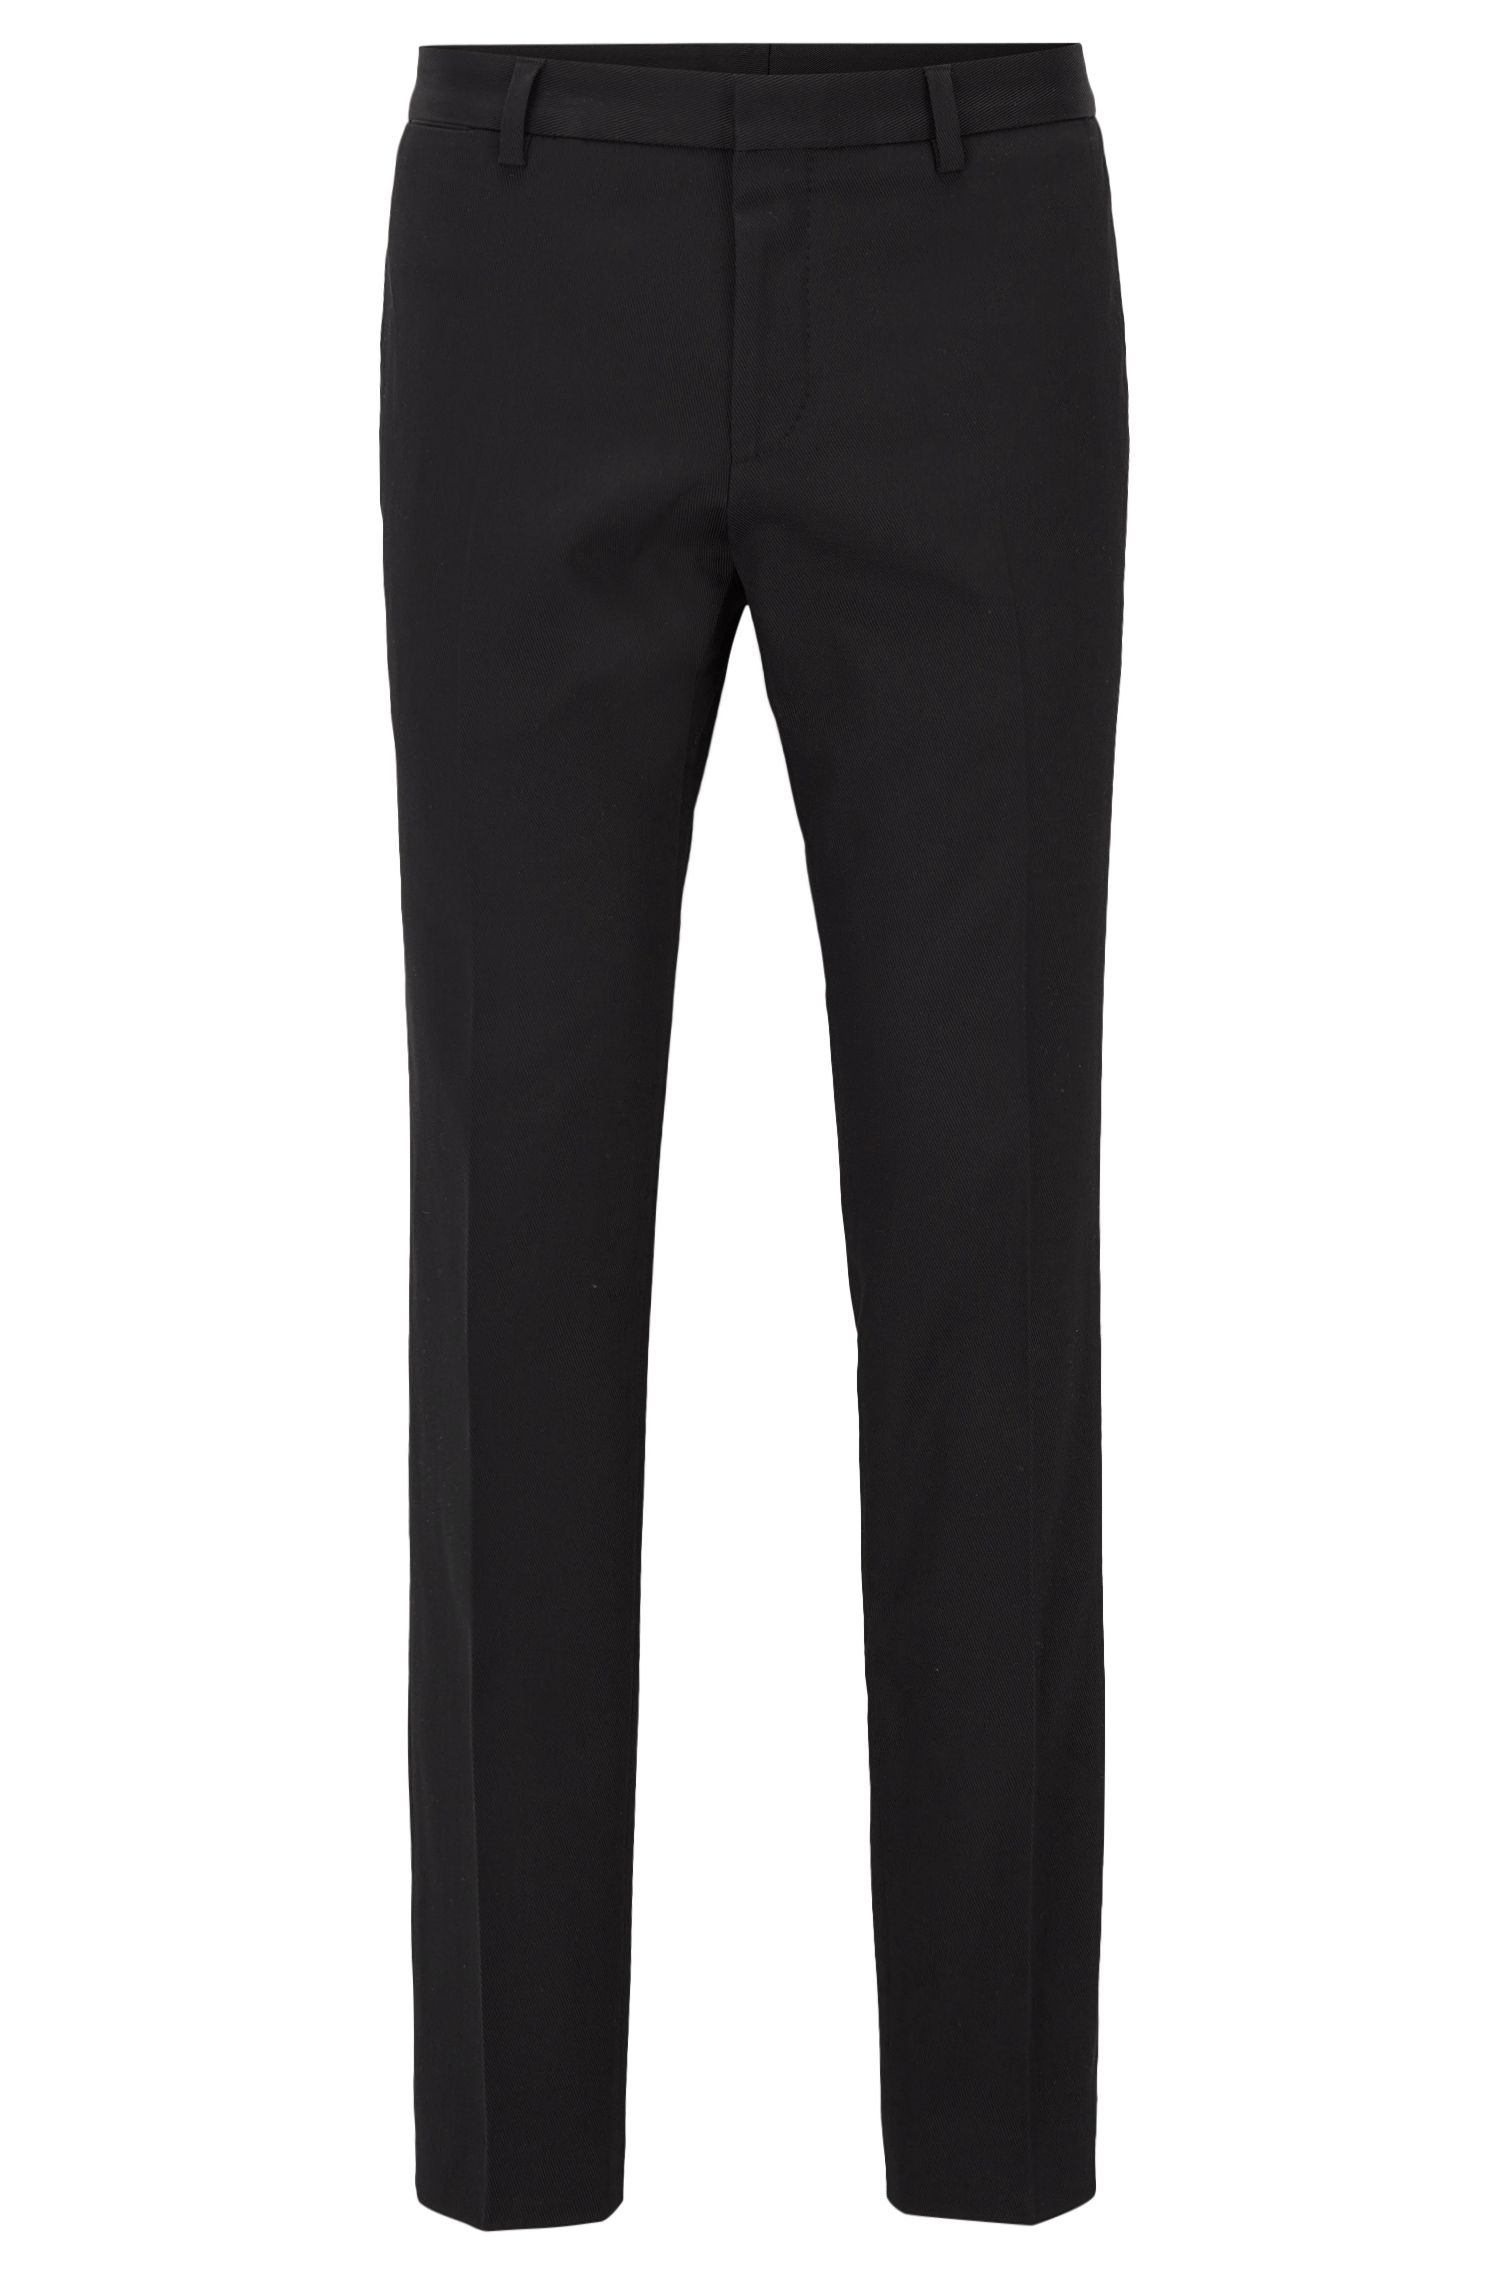 Stretch Cotton Dress Pant, Extra-Slim Fit | Winn